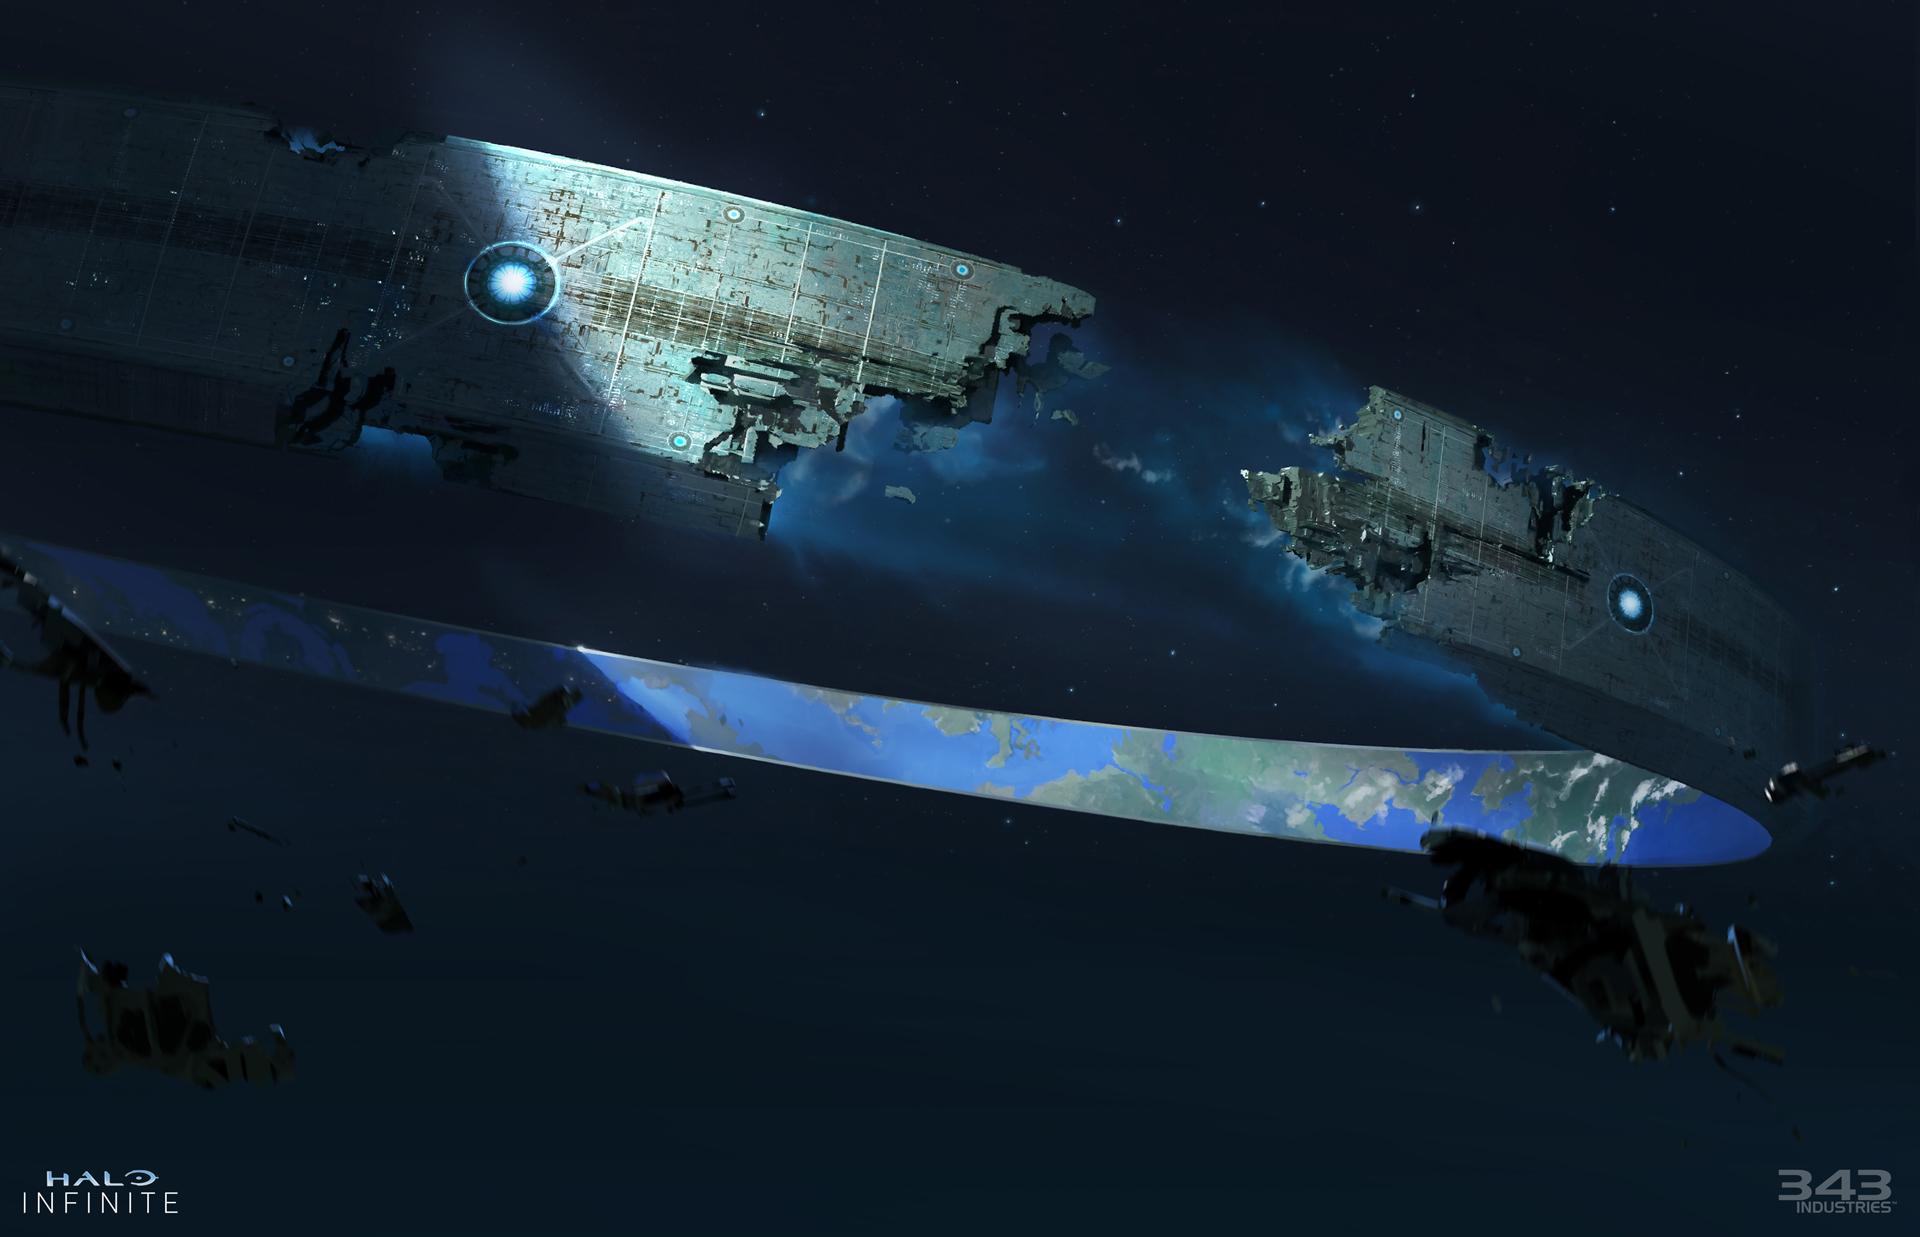 Concept art of a broken Zeta Halo with debris floating in space.